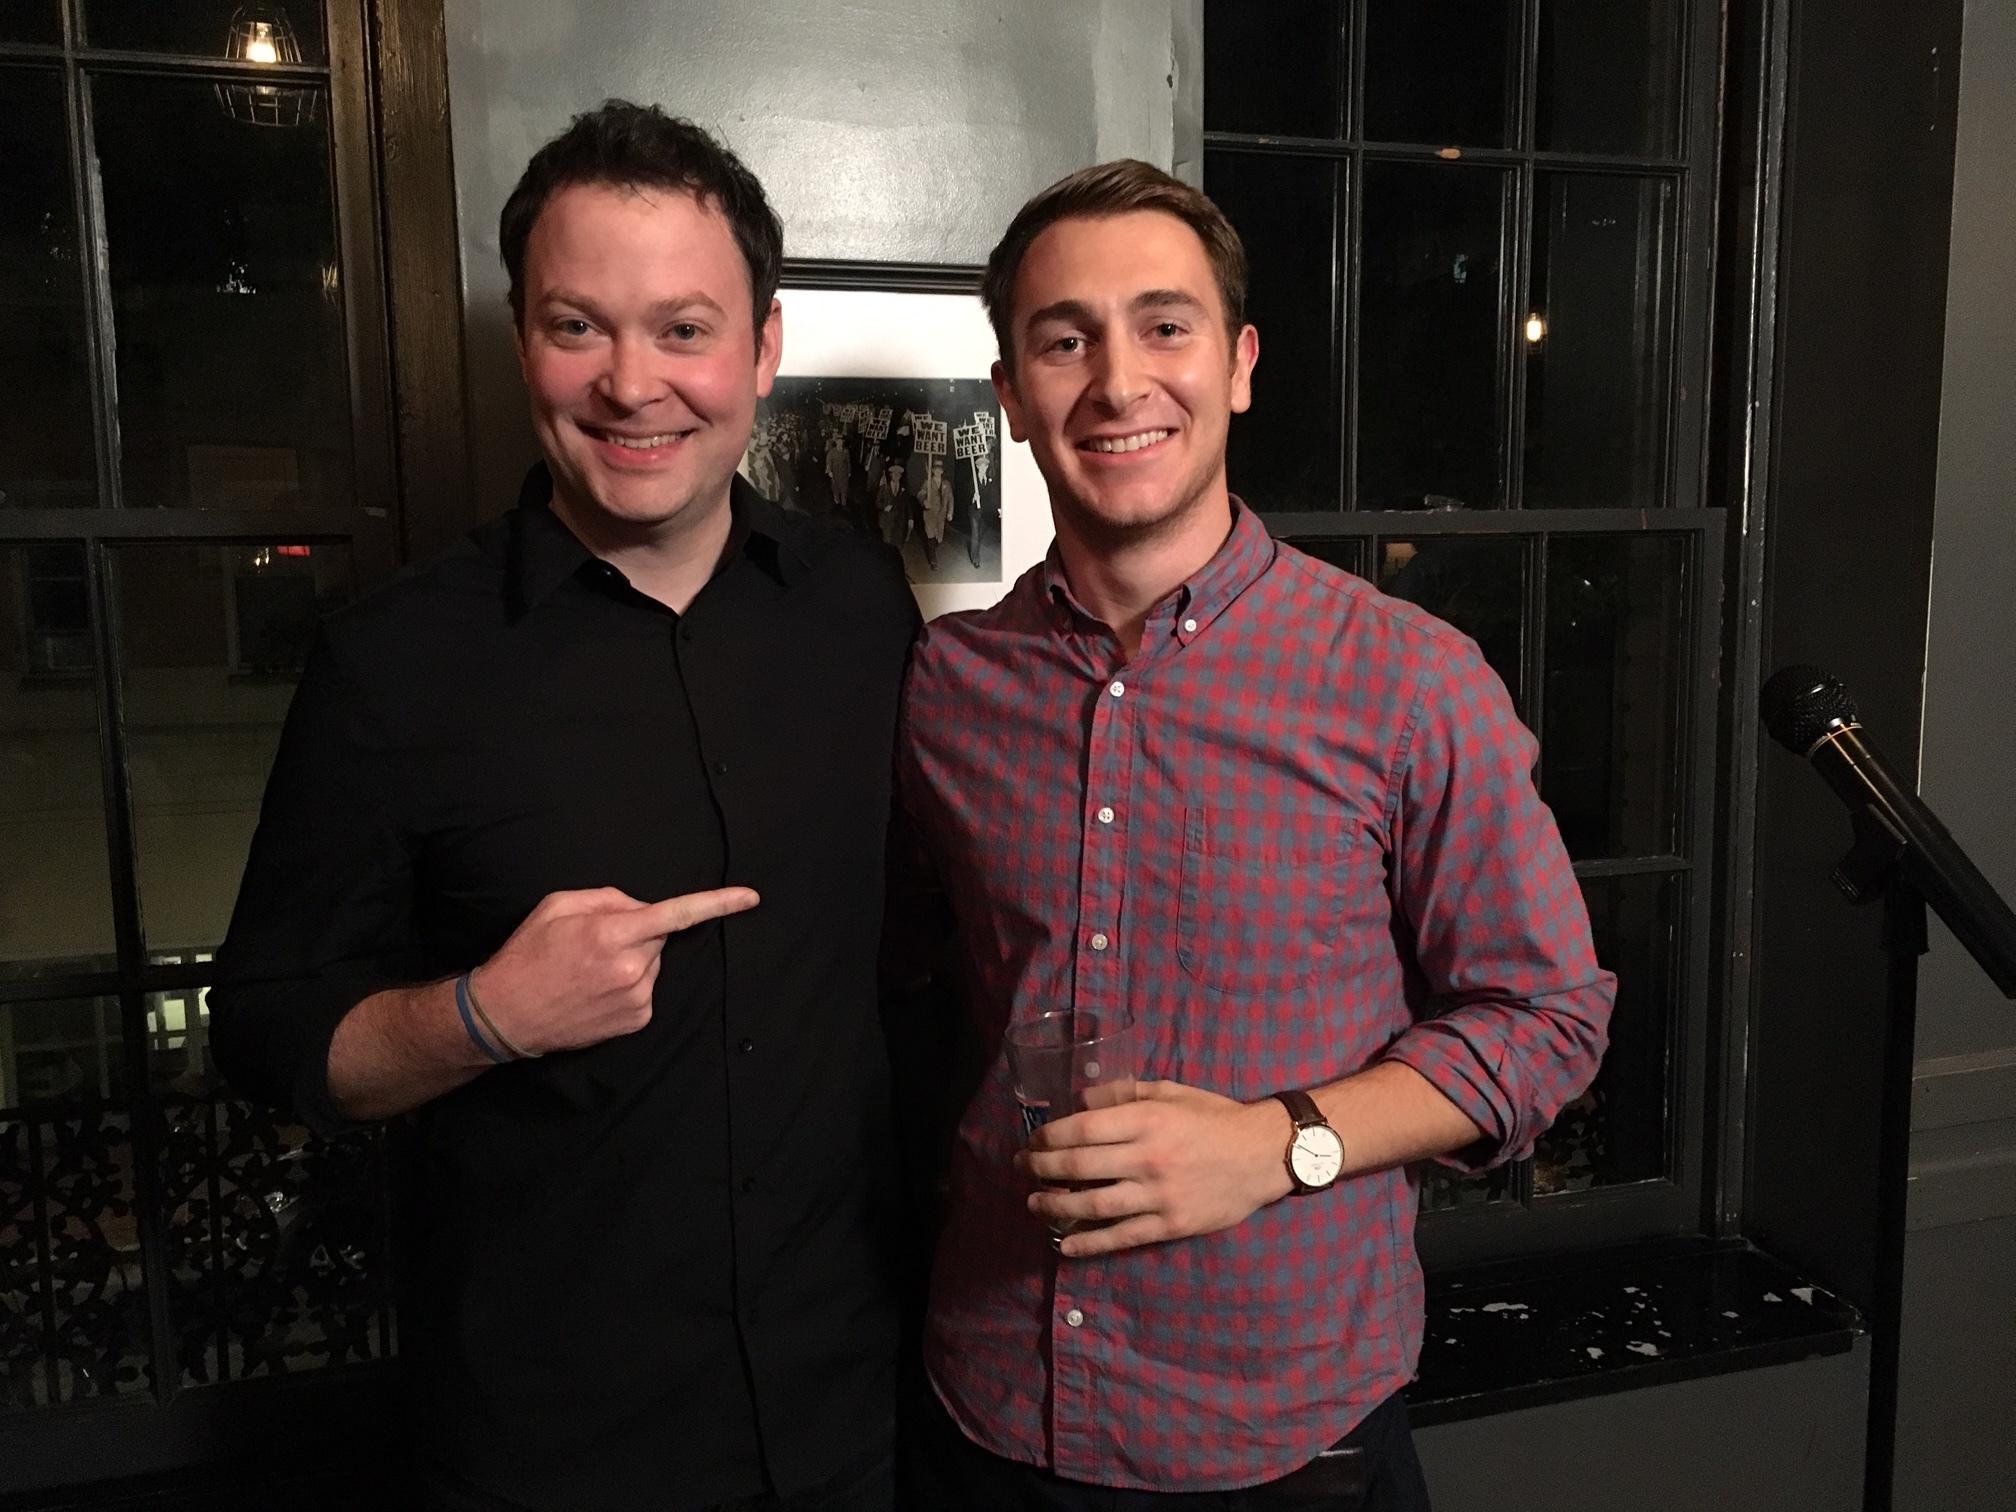 Emcee Mikey Gleason with winning storyteller Ethan Frankel